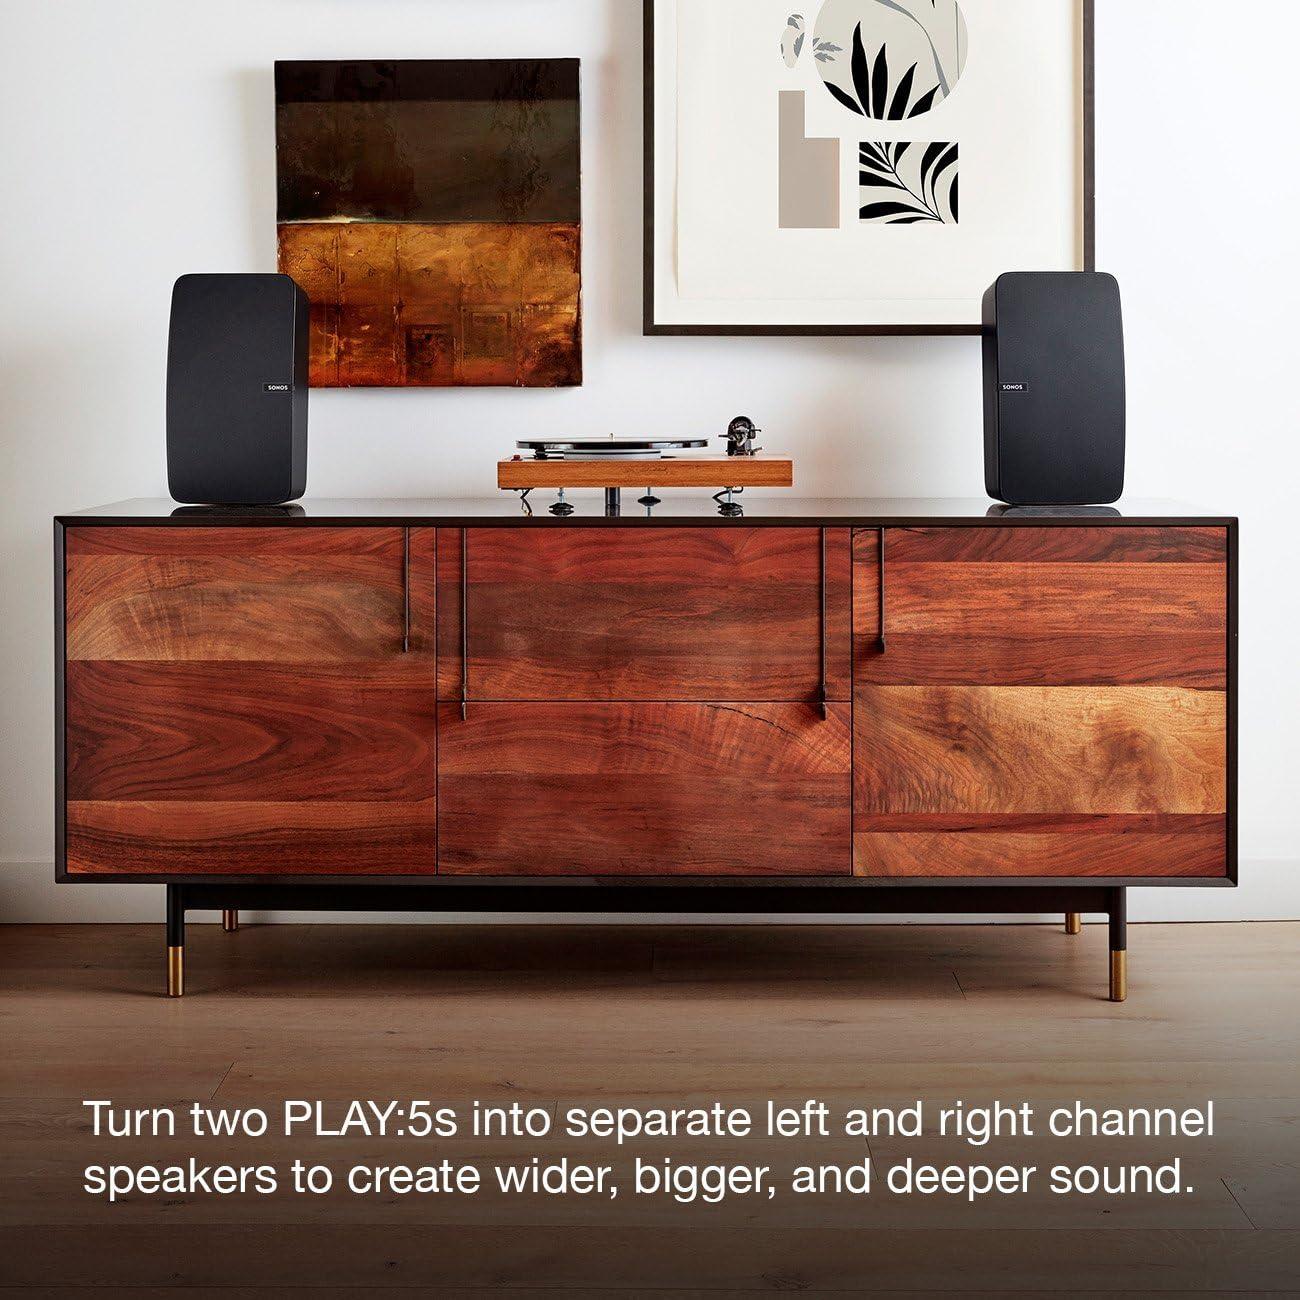 Sonos Play:5 - Ultimate Wireless Smart Speaker - Black